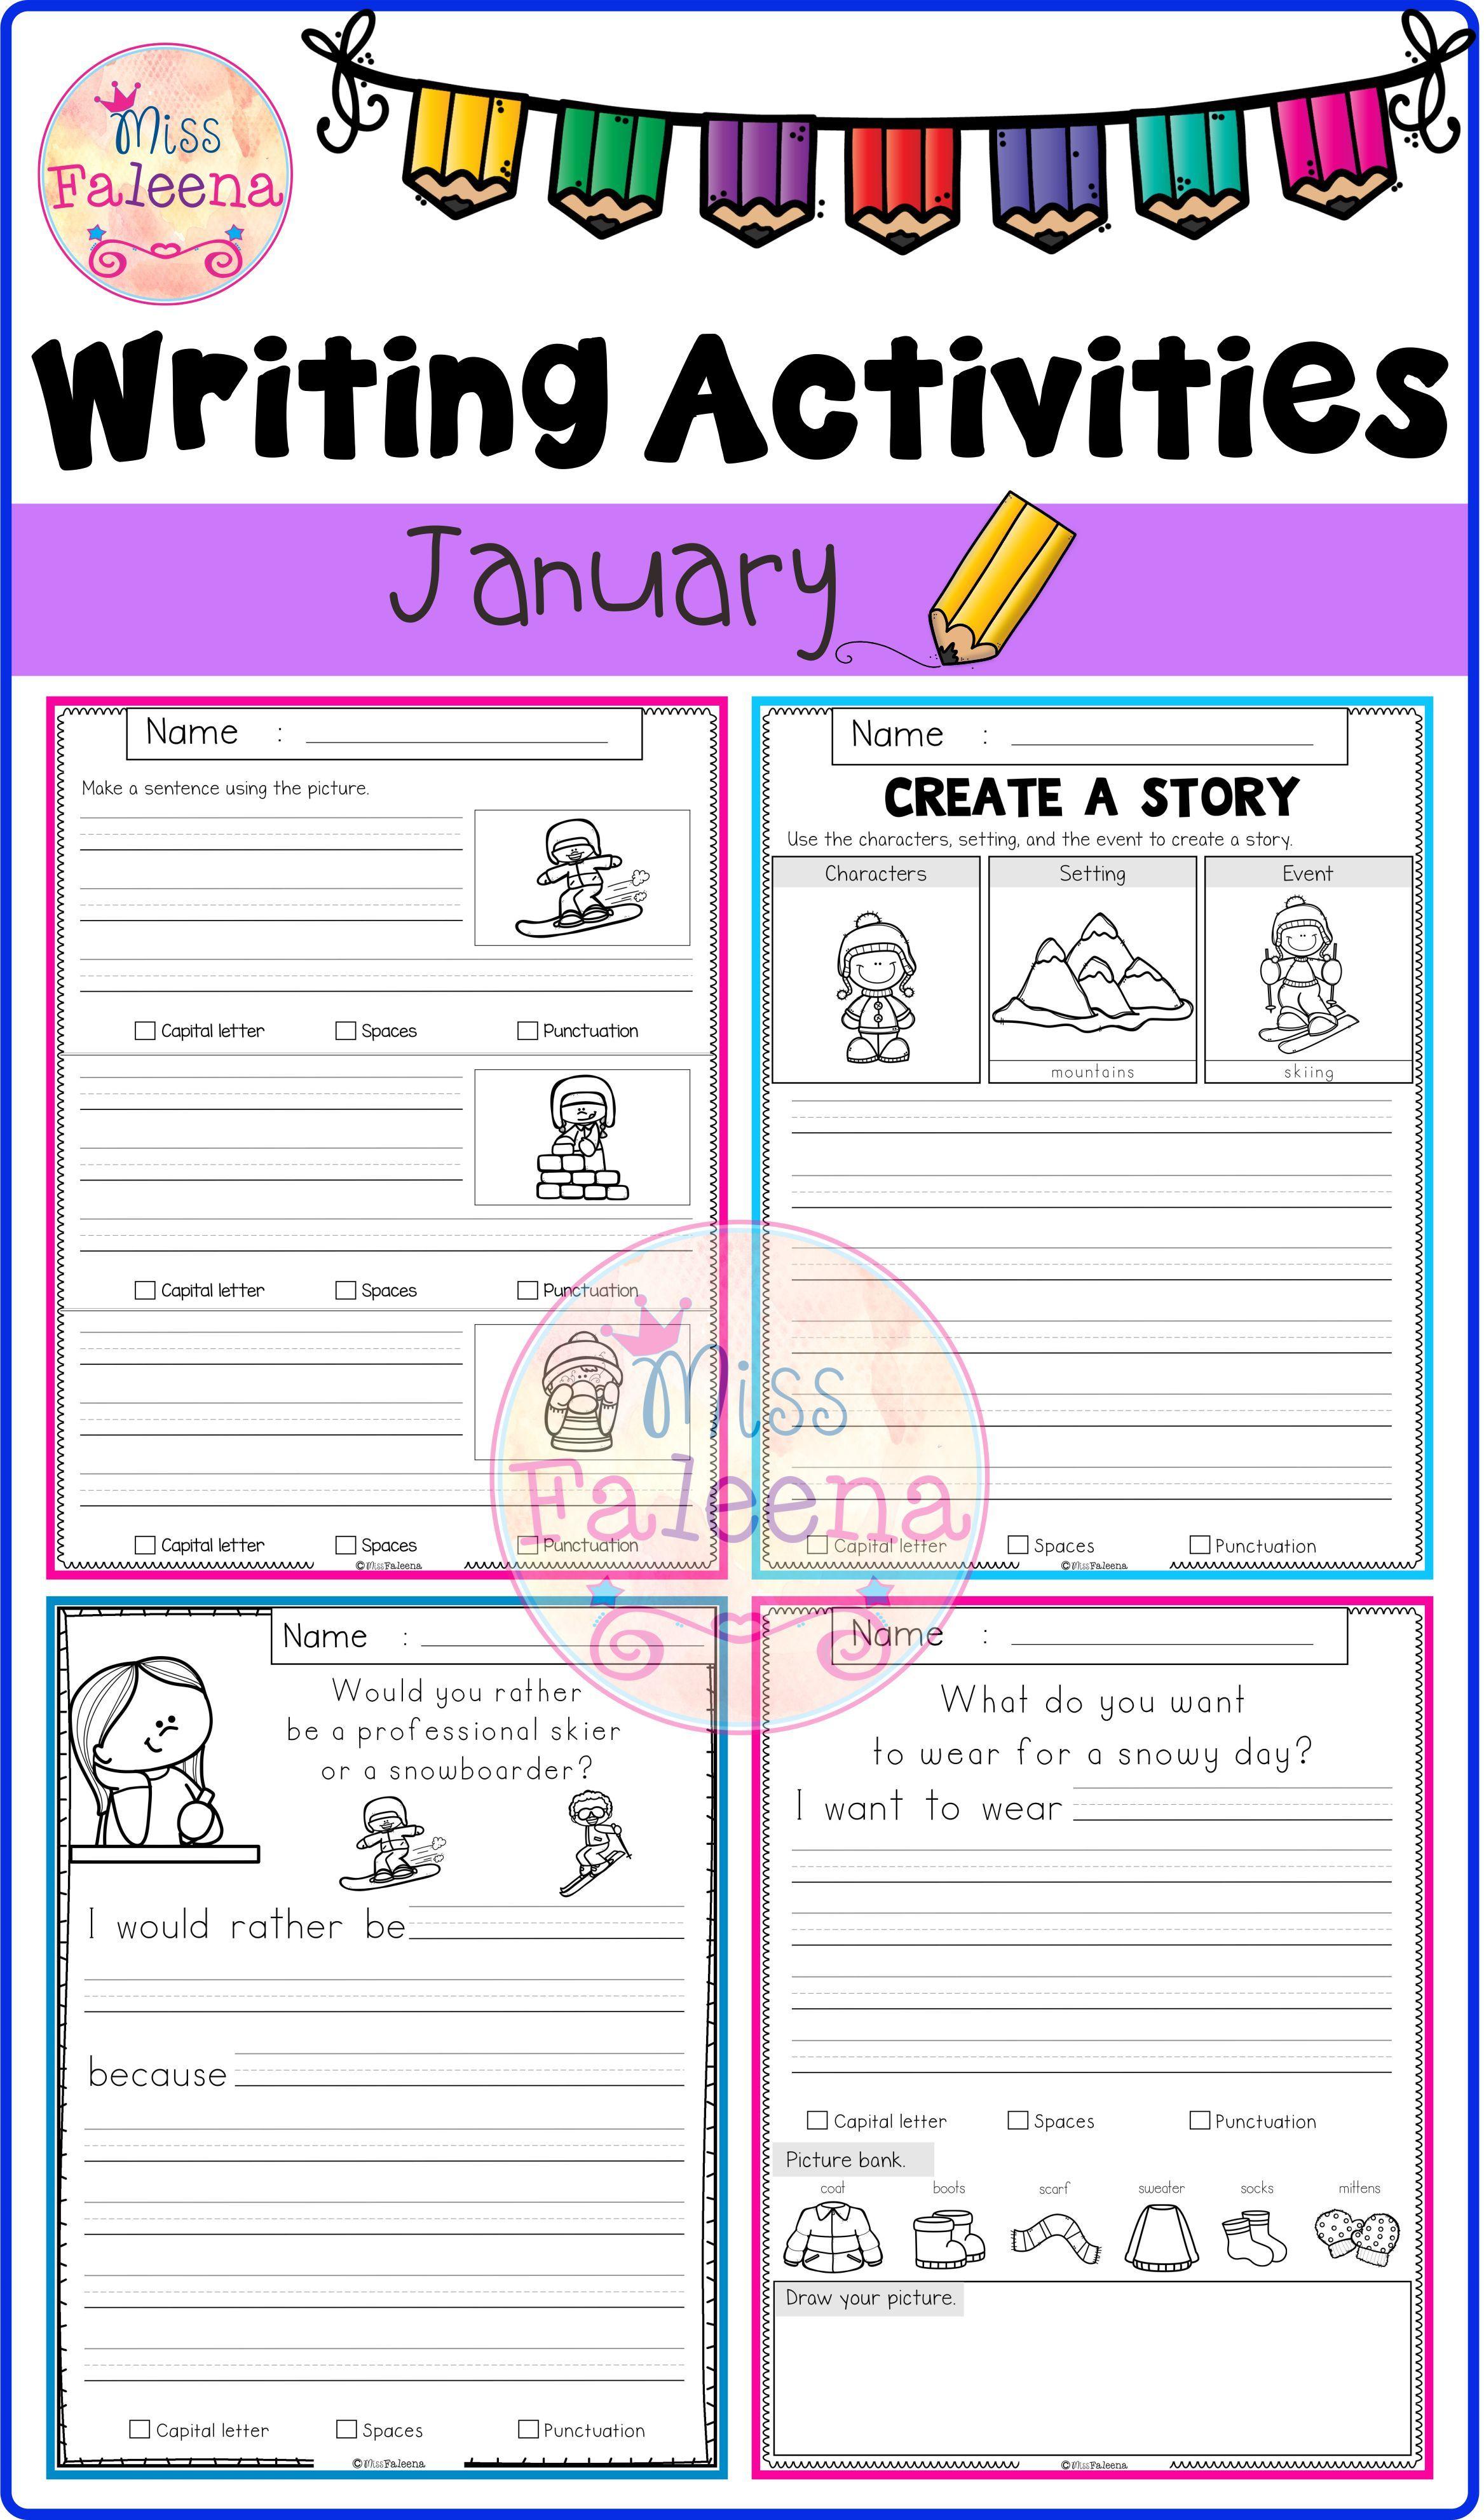 January Writing Activities